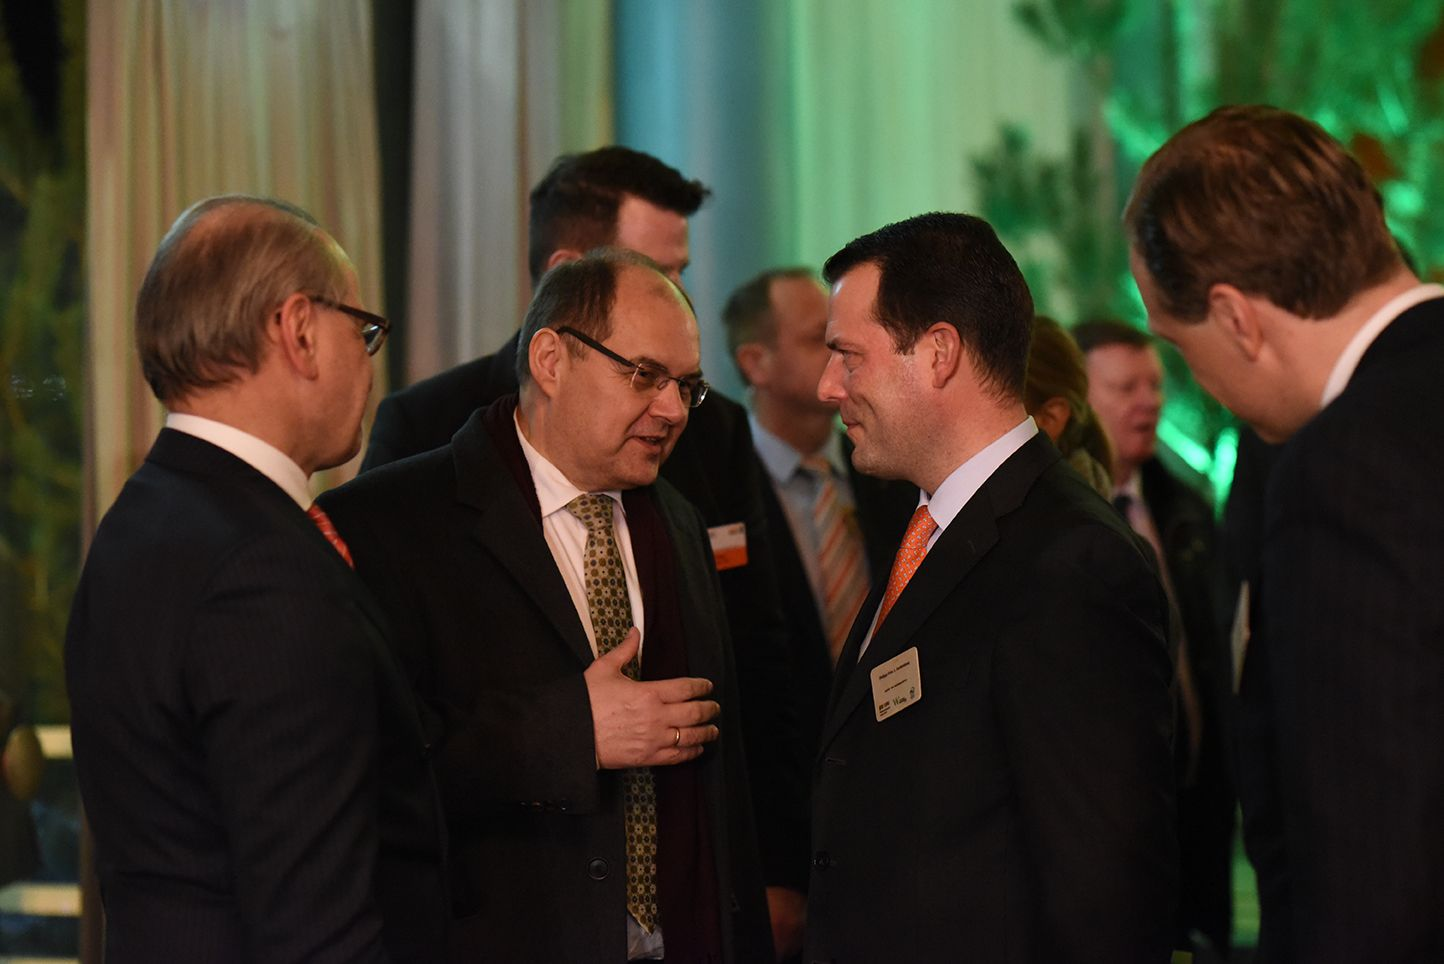 Empfang der Waldeigentümer: Bundeslandwirtschaftsminister Christian Schmidt